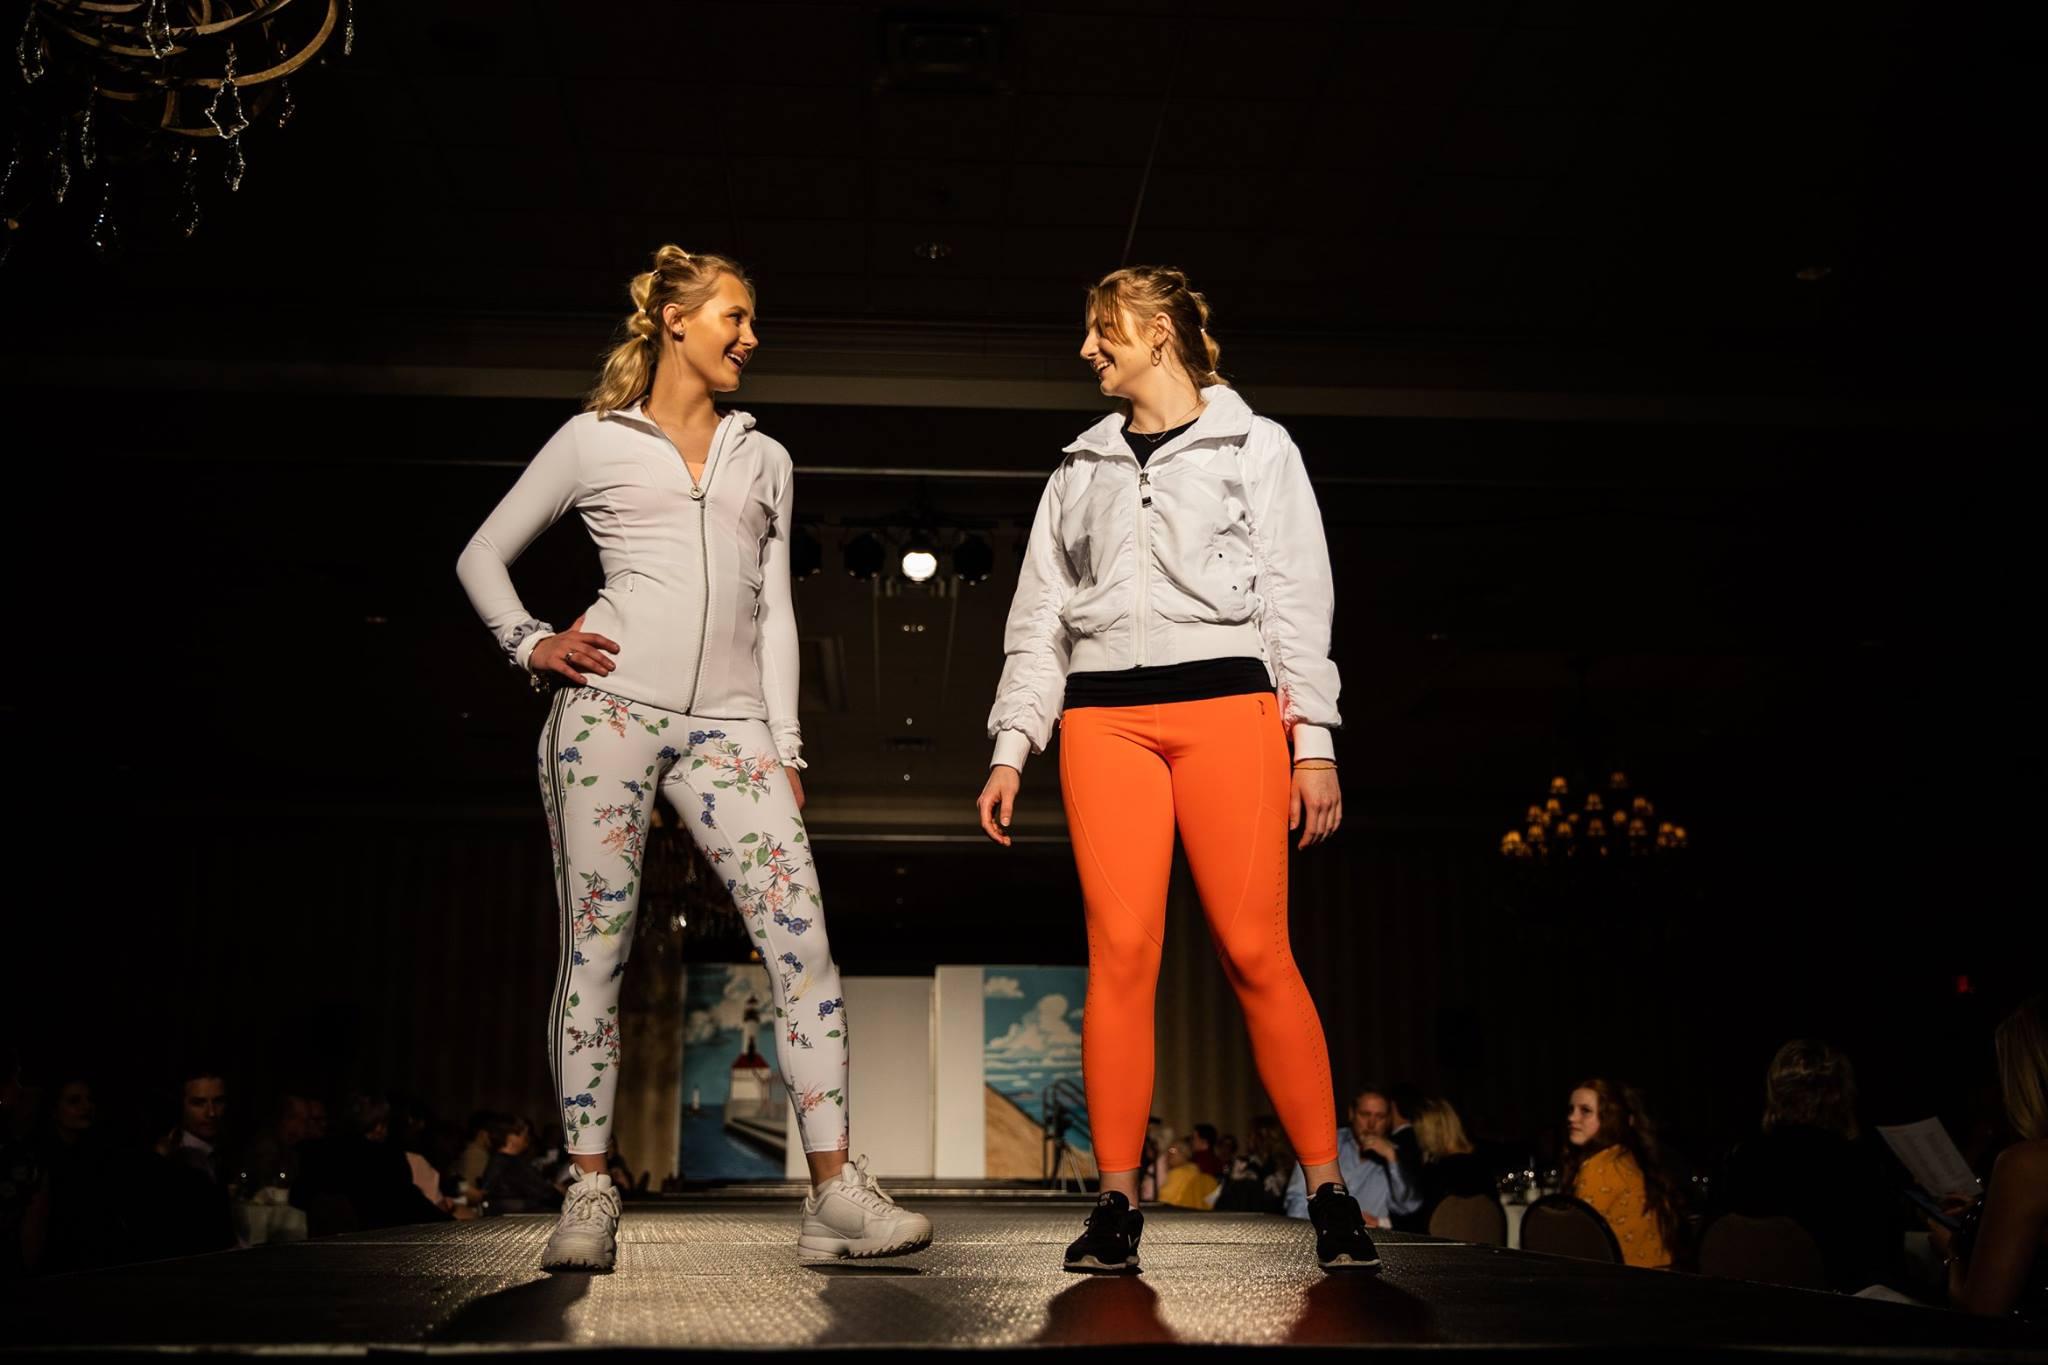 Lutheran_North_High_School_Macomb_Michigan_LHN_Fashion_Show_2019 (11).jpg